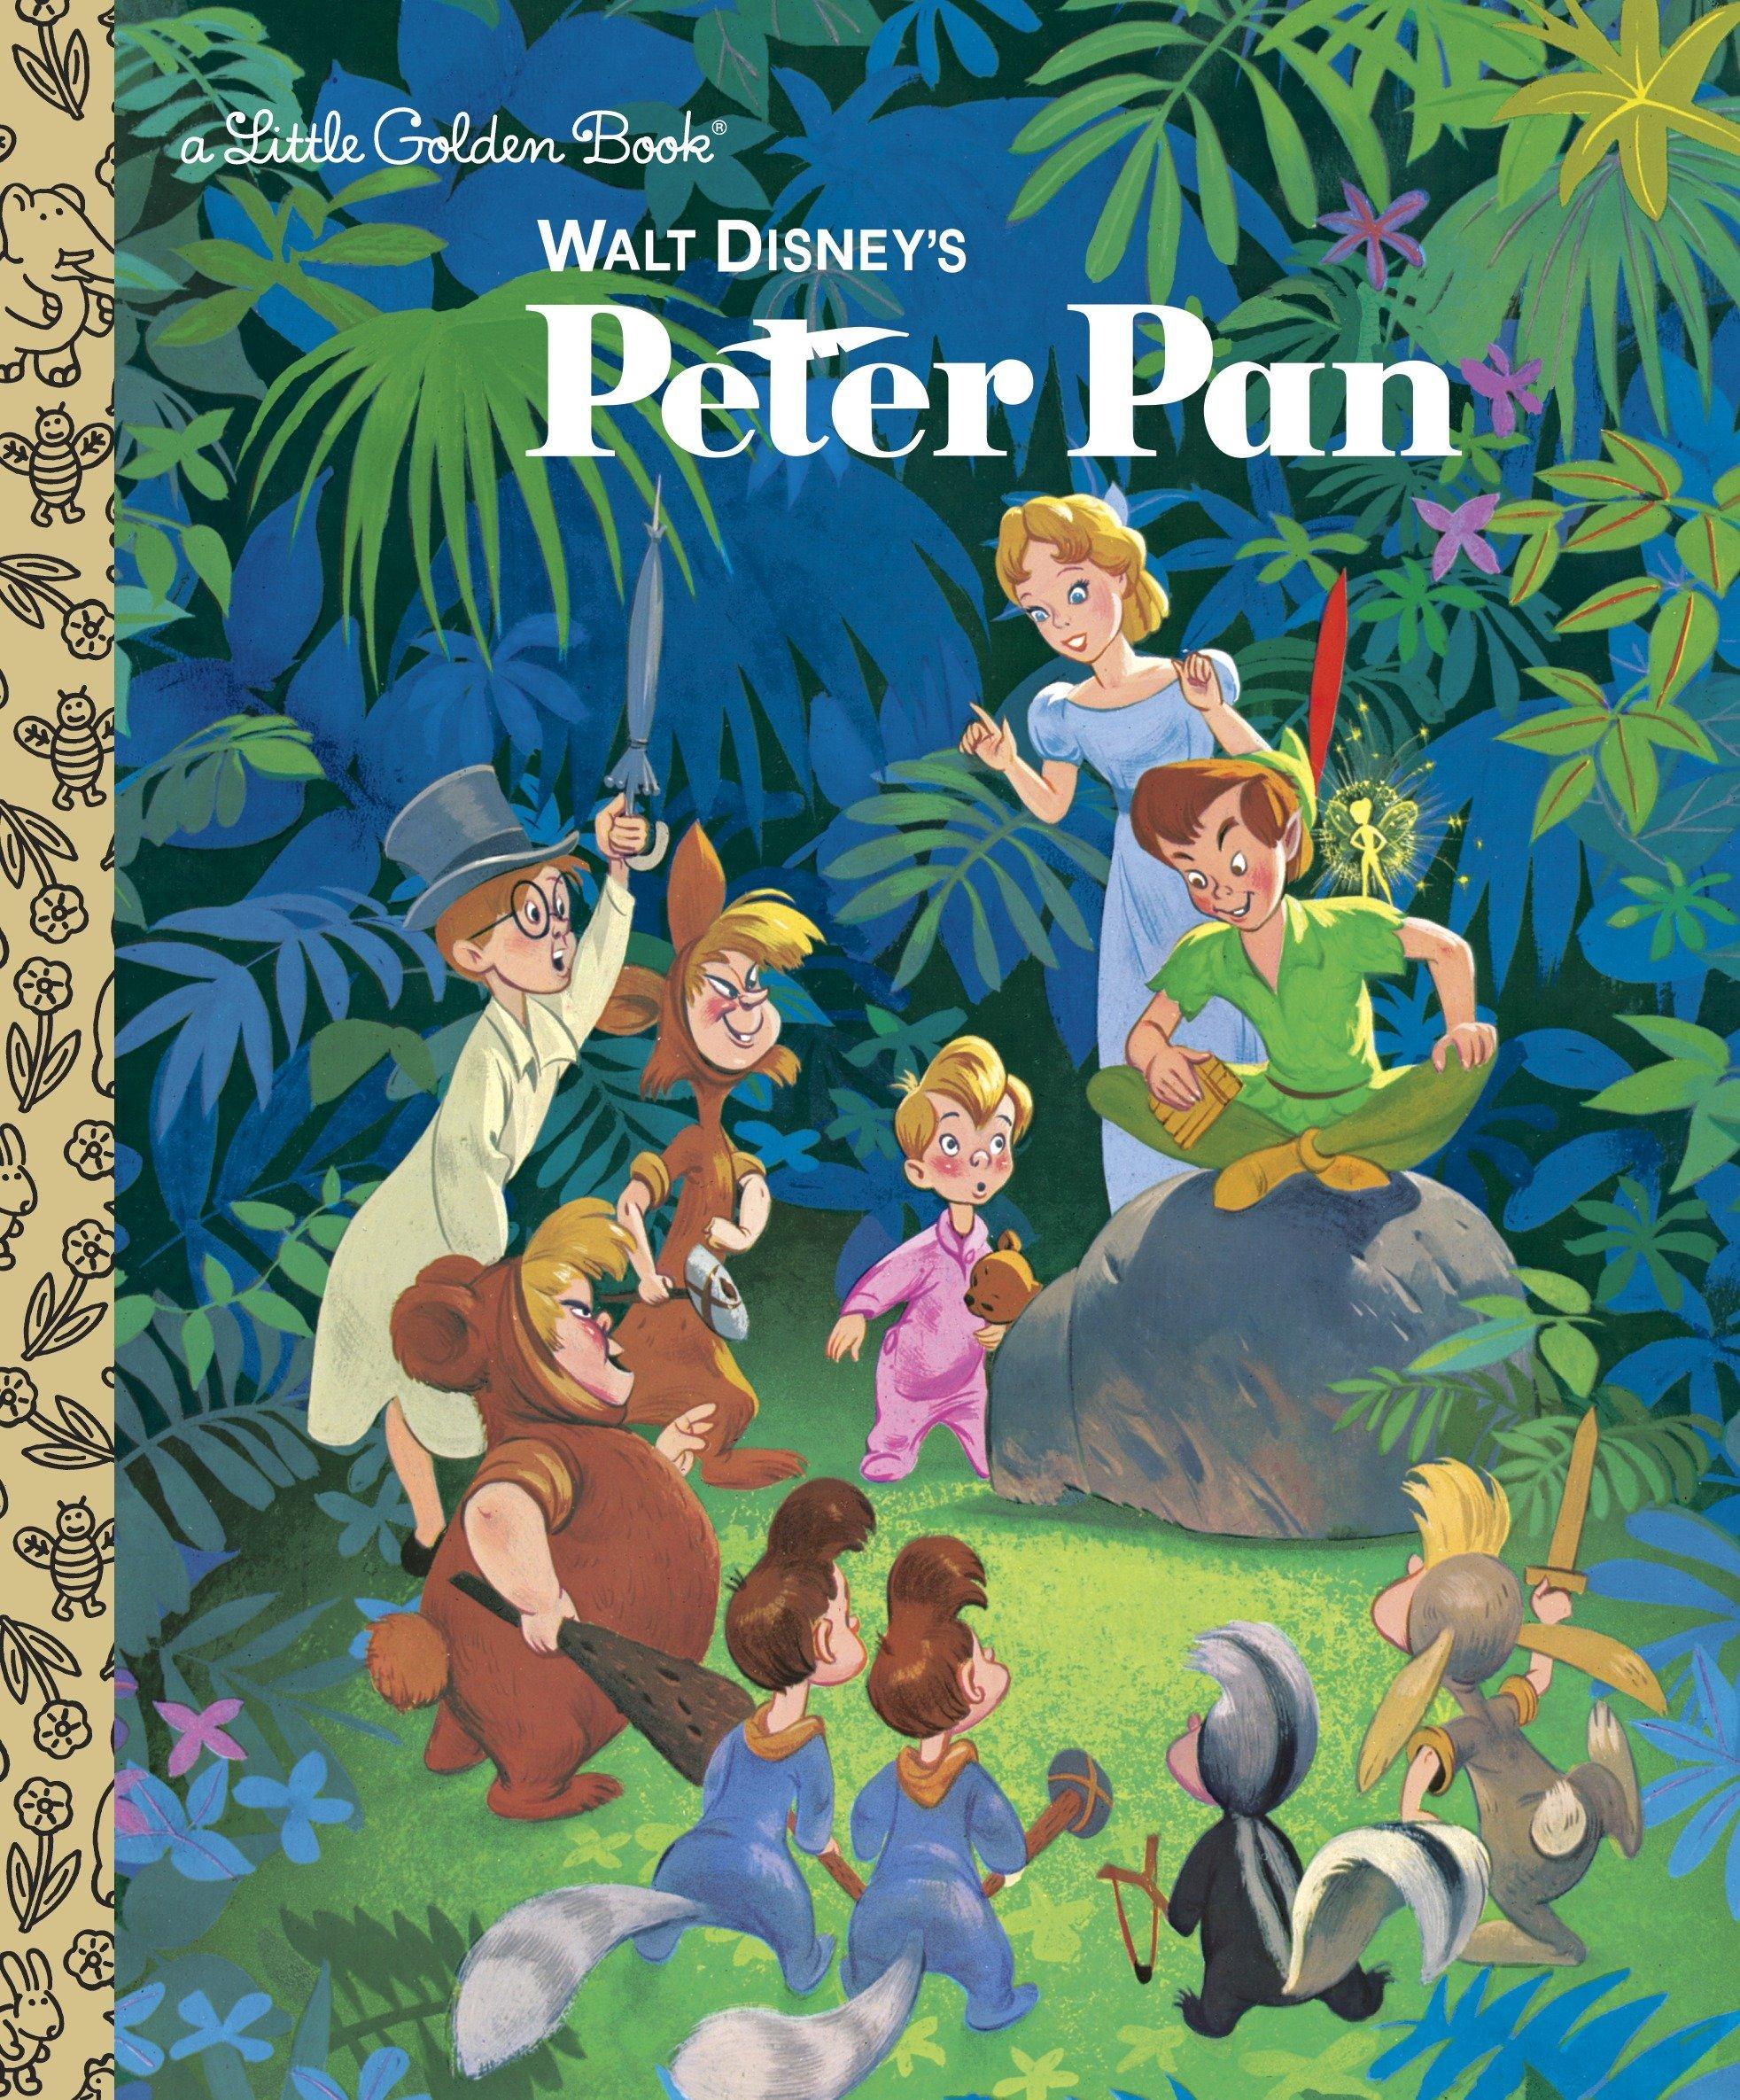 Image result for peter pan disney children's book a little golden book